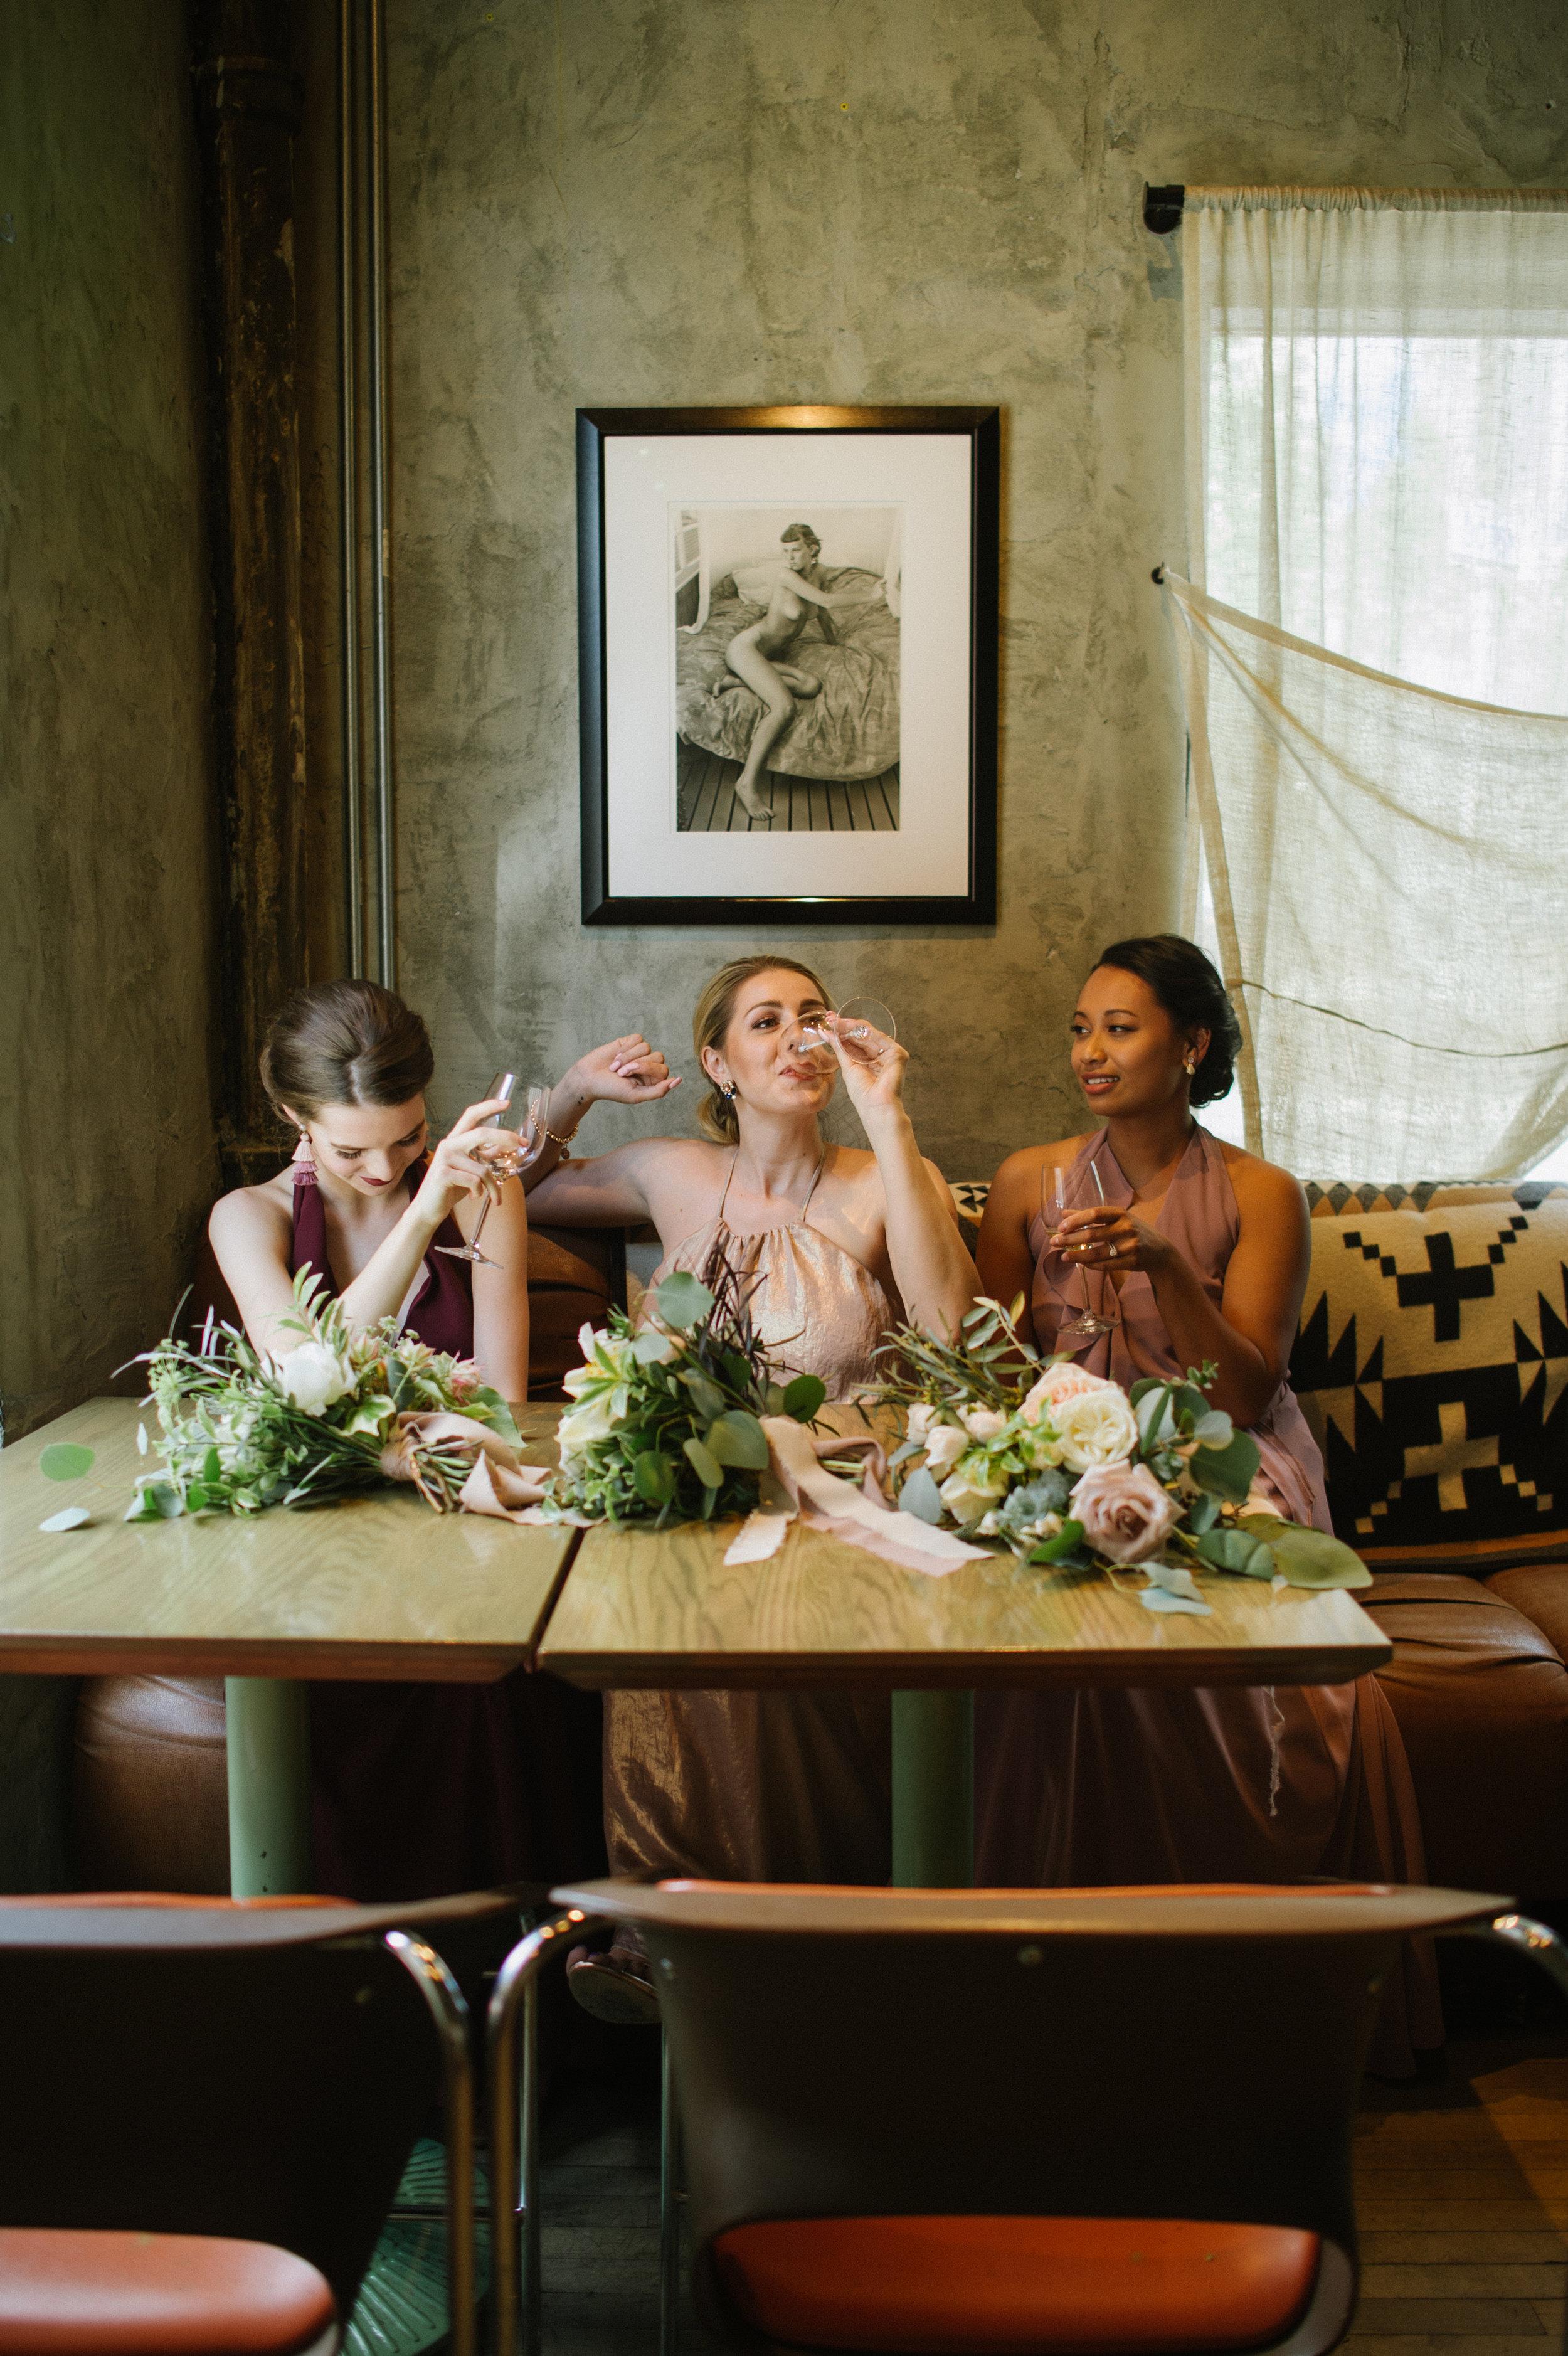 Calgary_Wedding_Photography_Bridgette_Bar_Bridesmaids_Shoot_2018_HR093.jpg